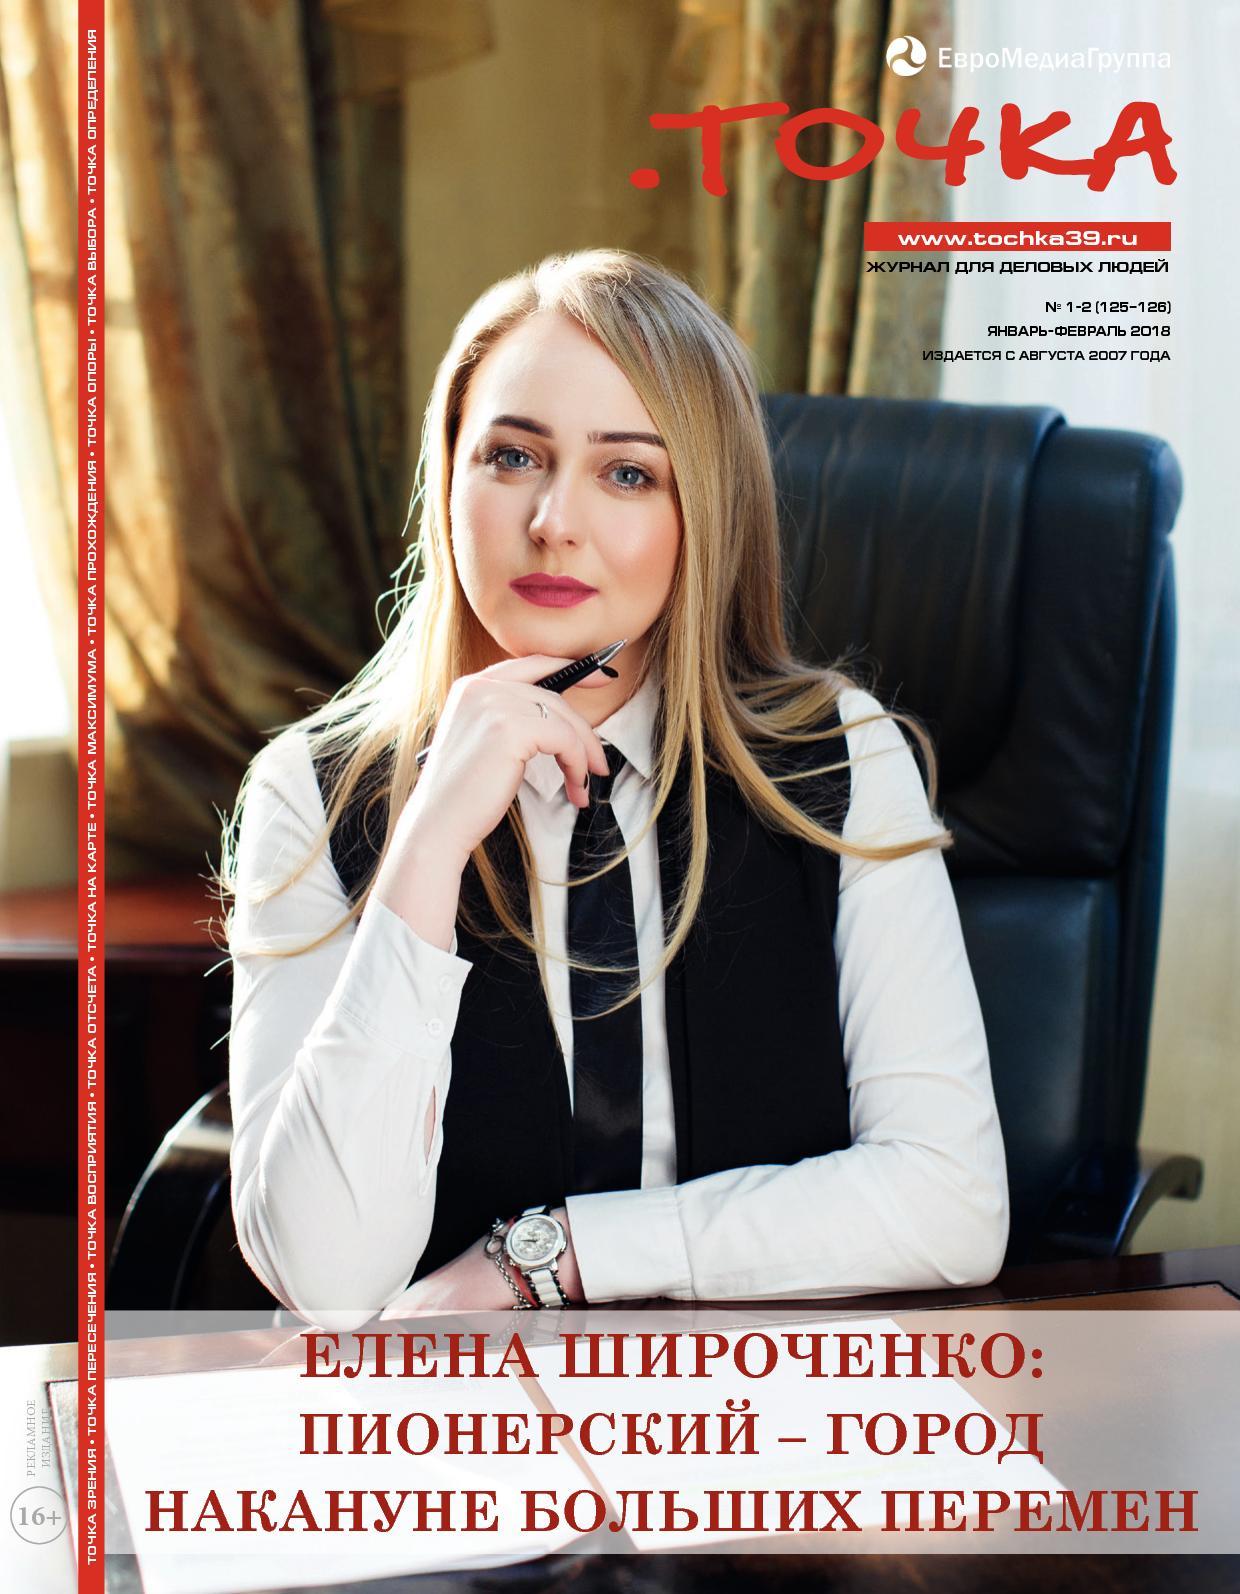 Carla Sidoruk